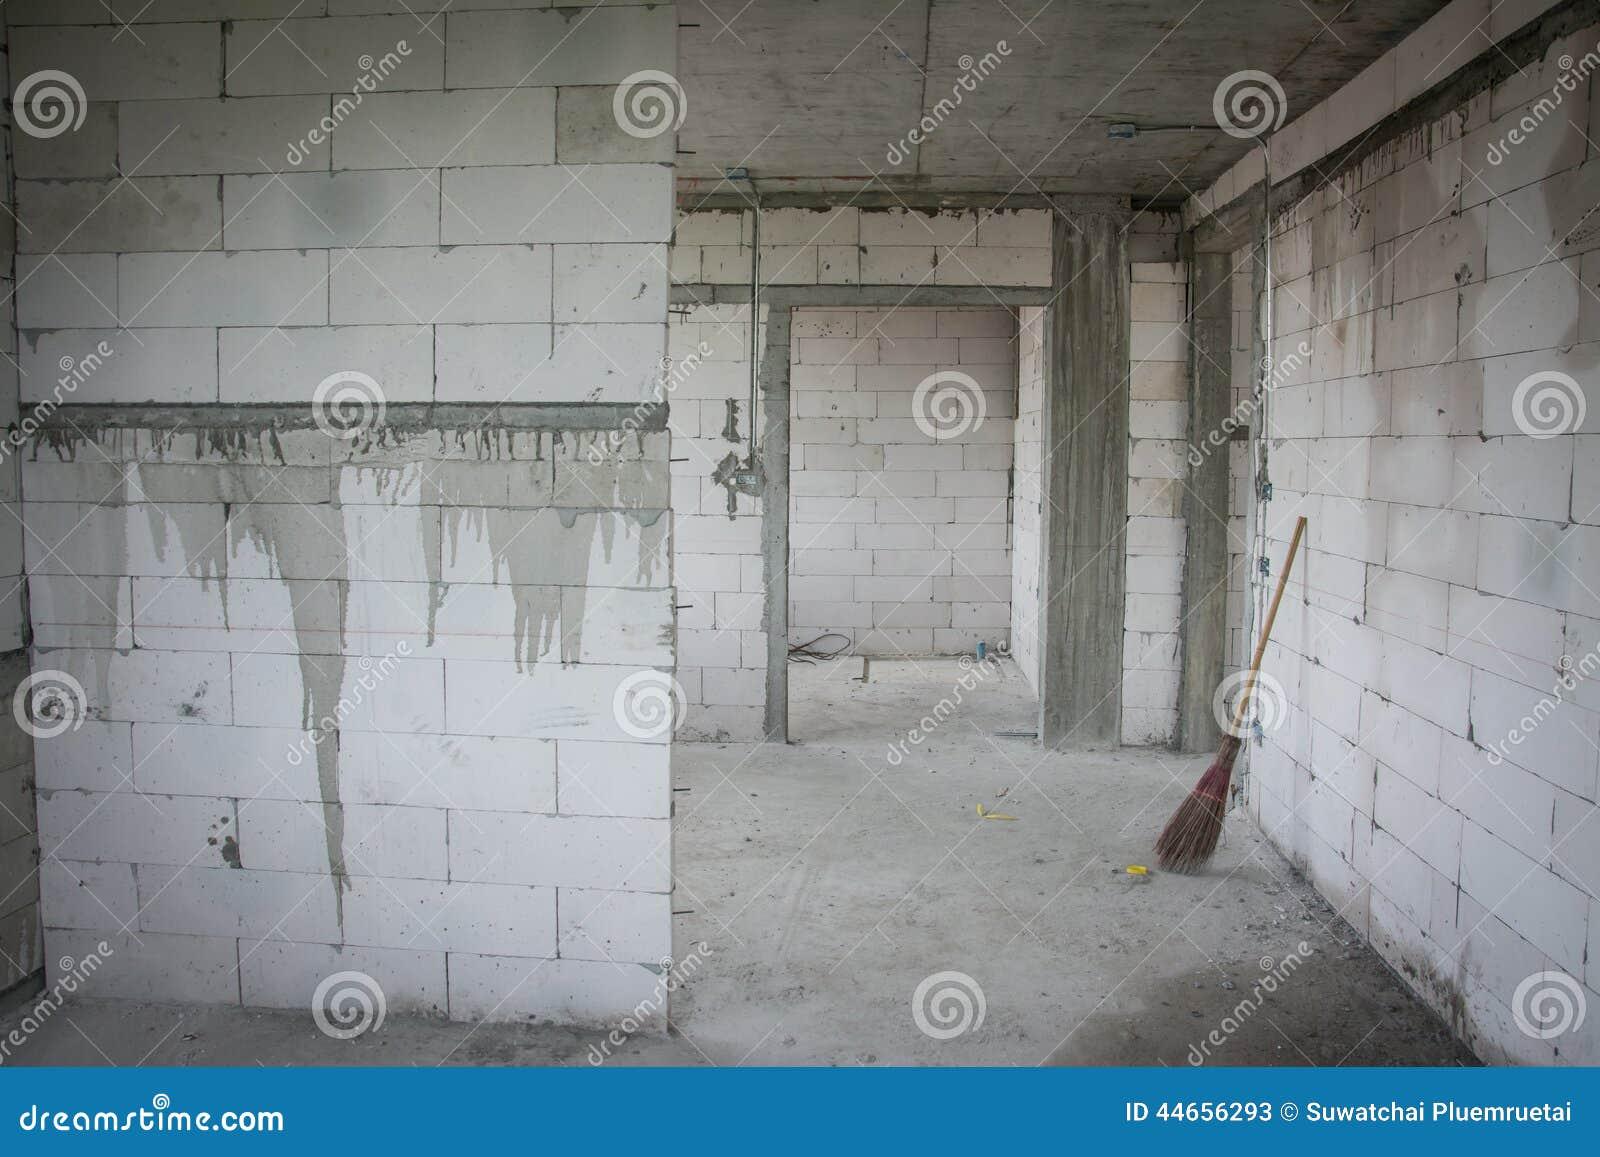 Building Inside Under Construction Stock Photo - Image: 44656293